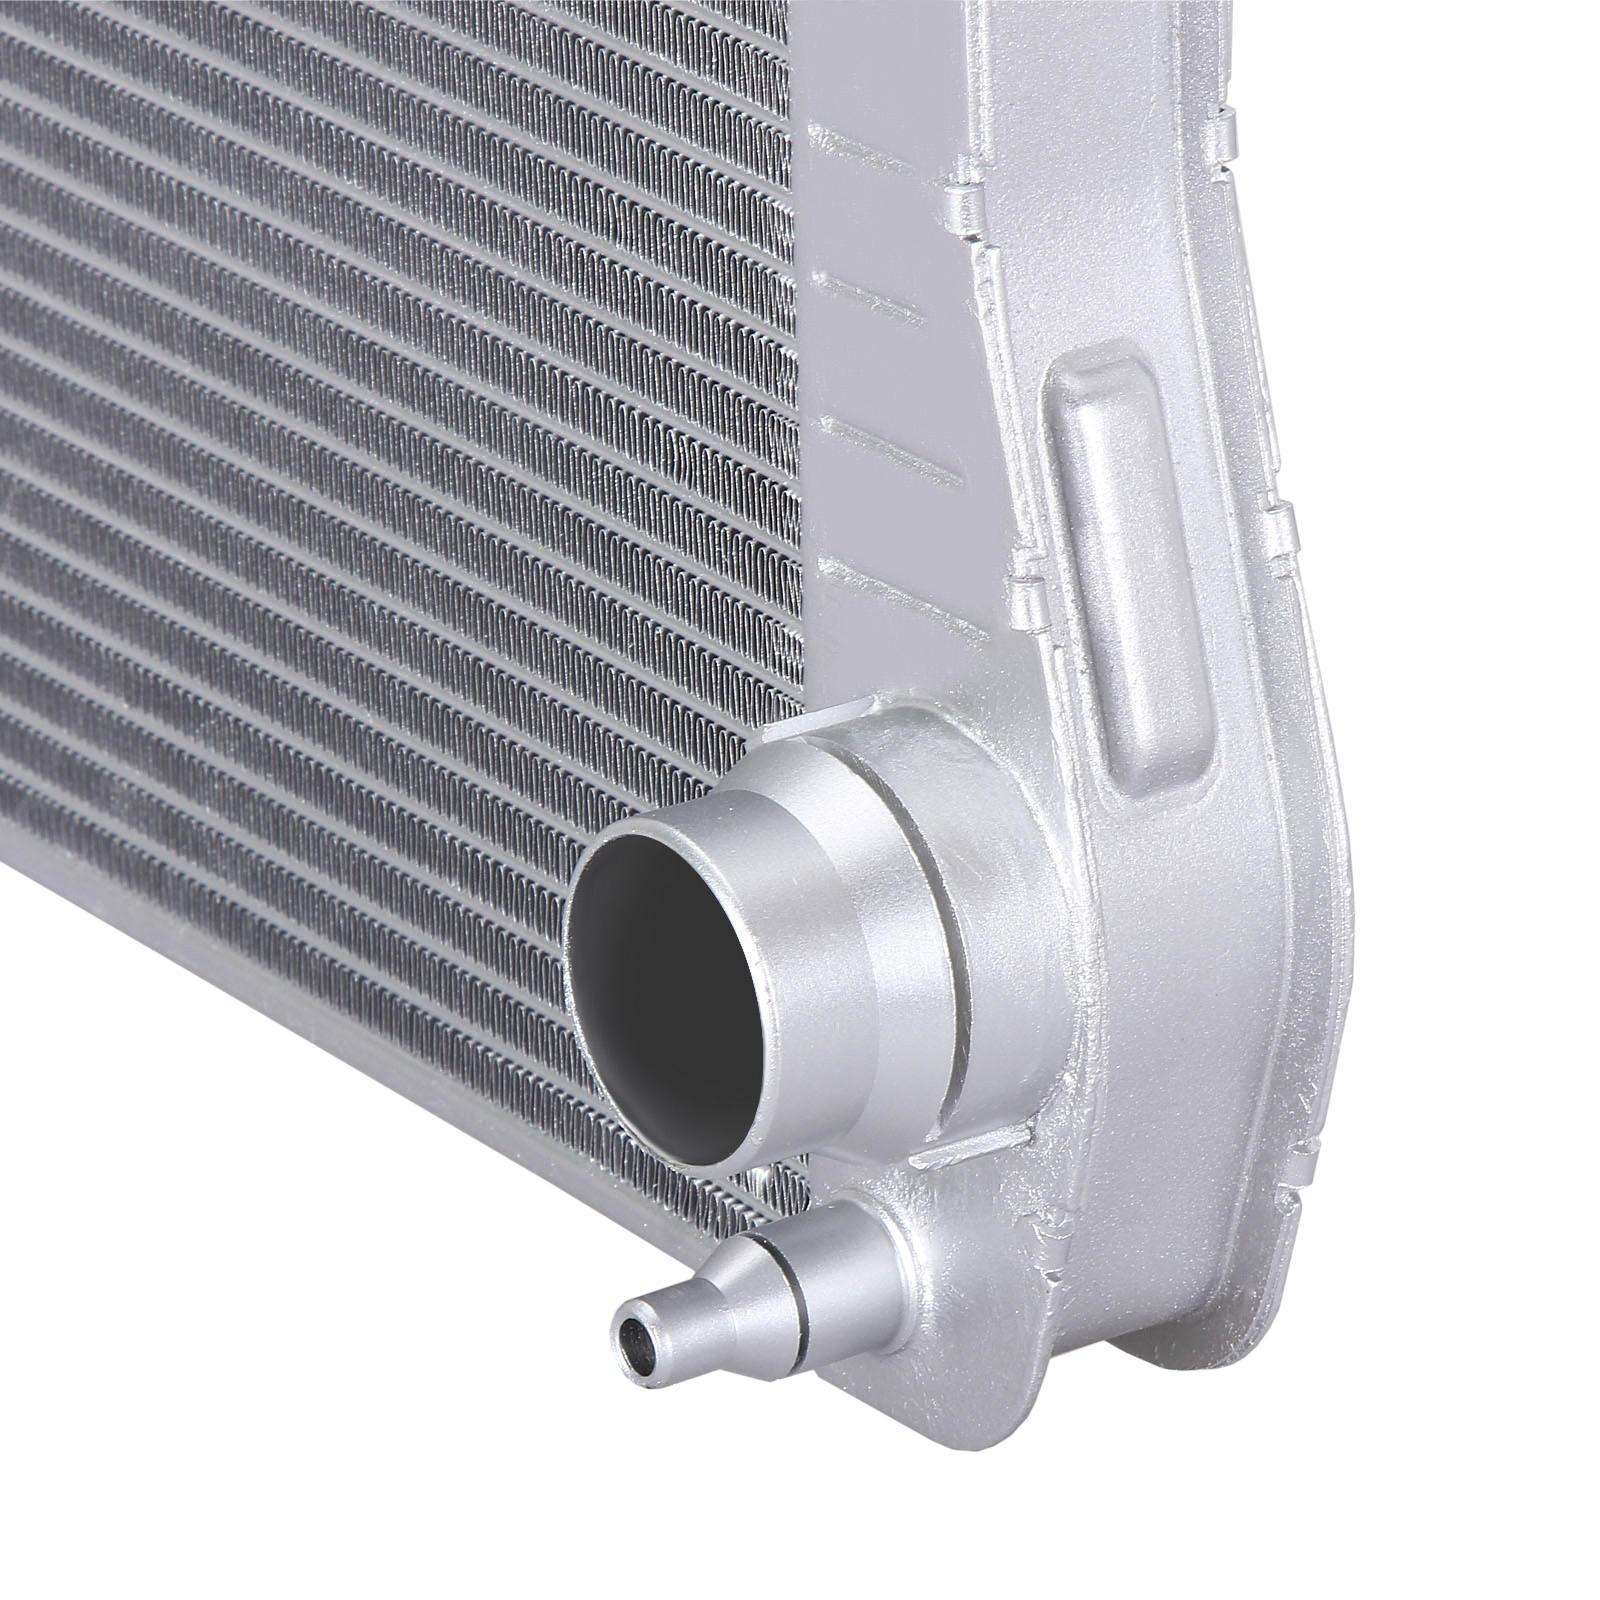 Car Radiator For BMW 528i 530i 528i Lujo Top Active Dynamic M Sport Hatchback TopBusiness F1 Sedan 4-Door 17117603745